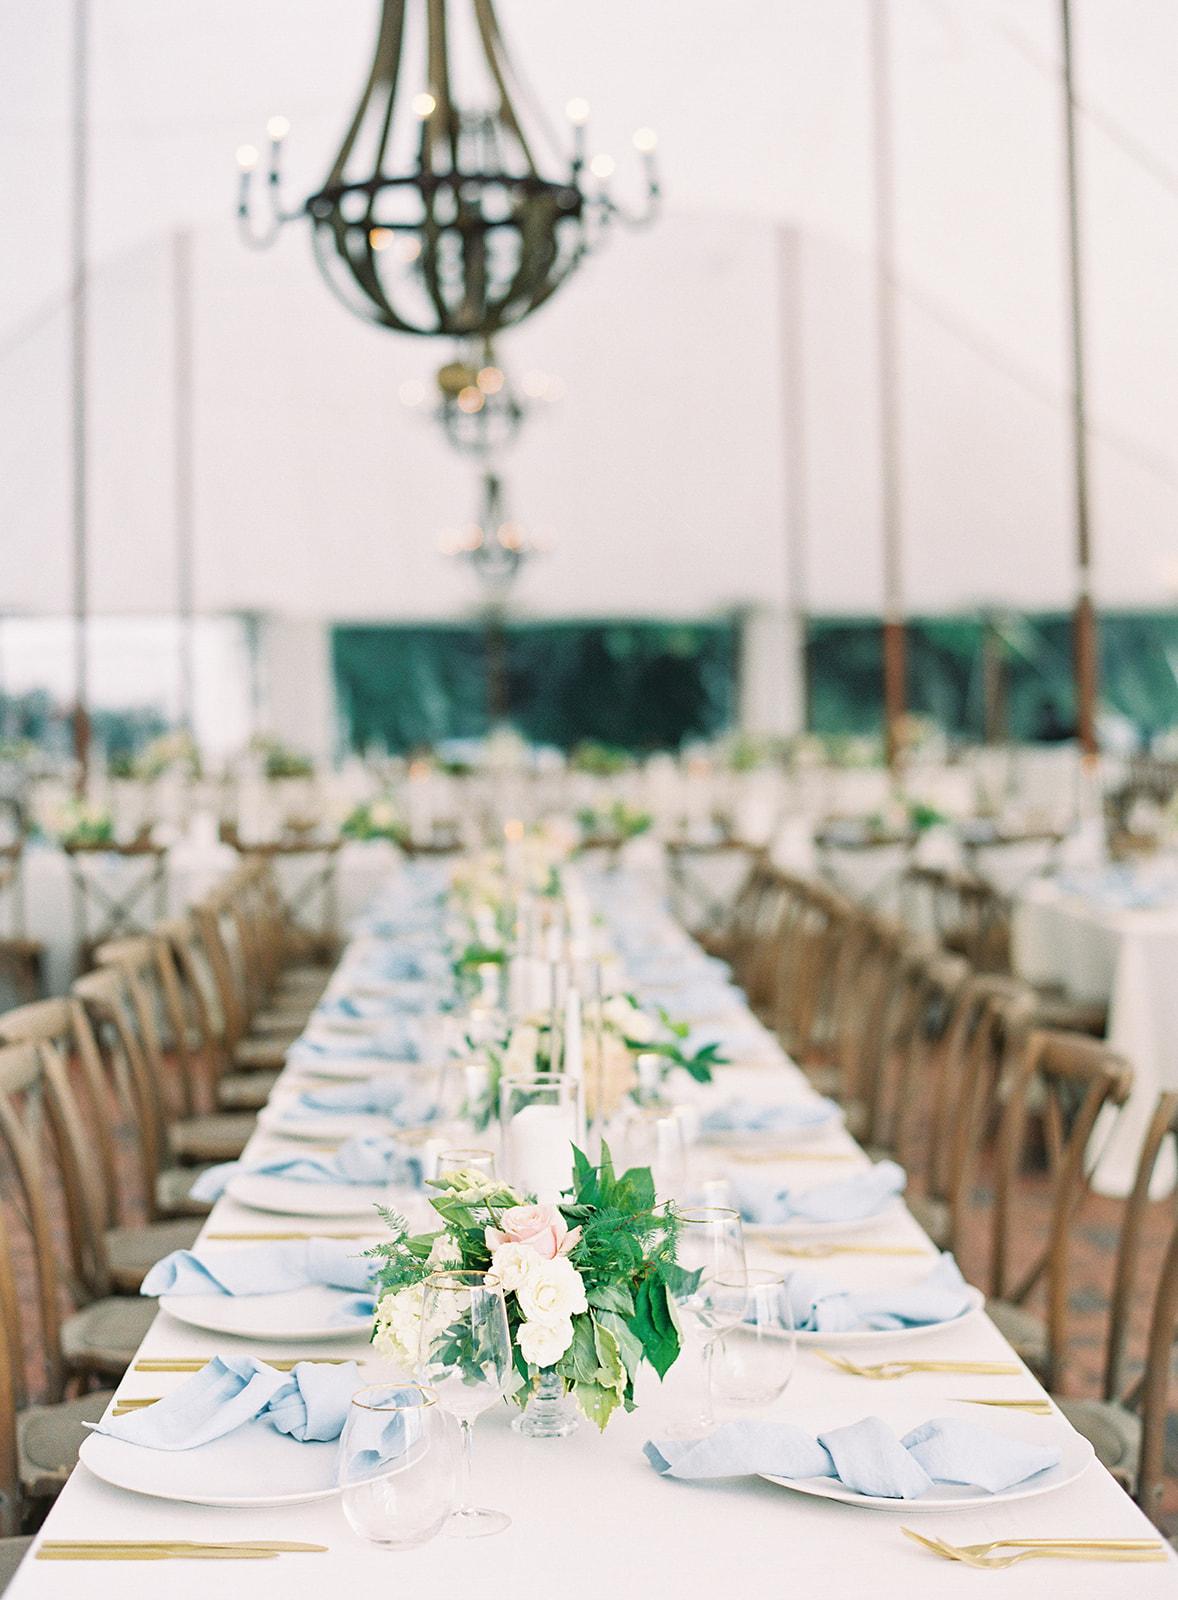 CM-Editorial-40-Jen-Huang-008845-R1-001.jpgSophie Felts Floral Design   C + M Brittland Manor   Fall Wedding   Jen Huang   DC Wedding Florist   Eastern Shore Wedding Florist  